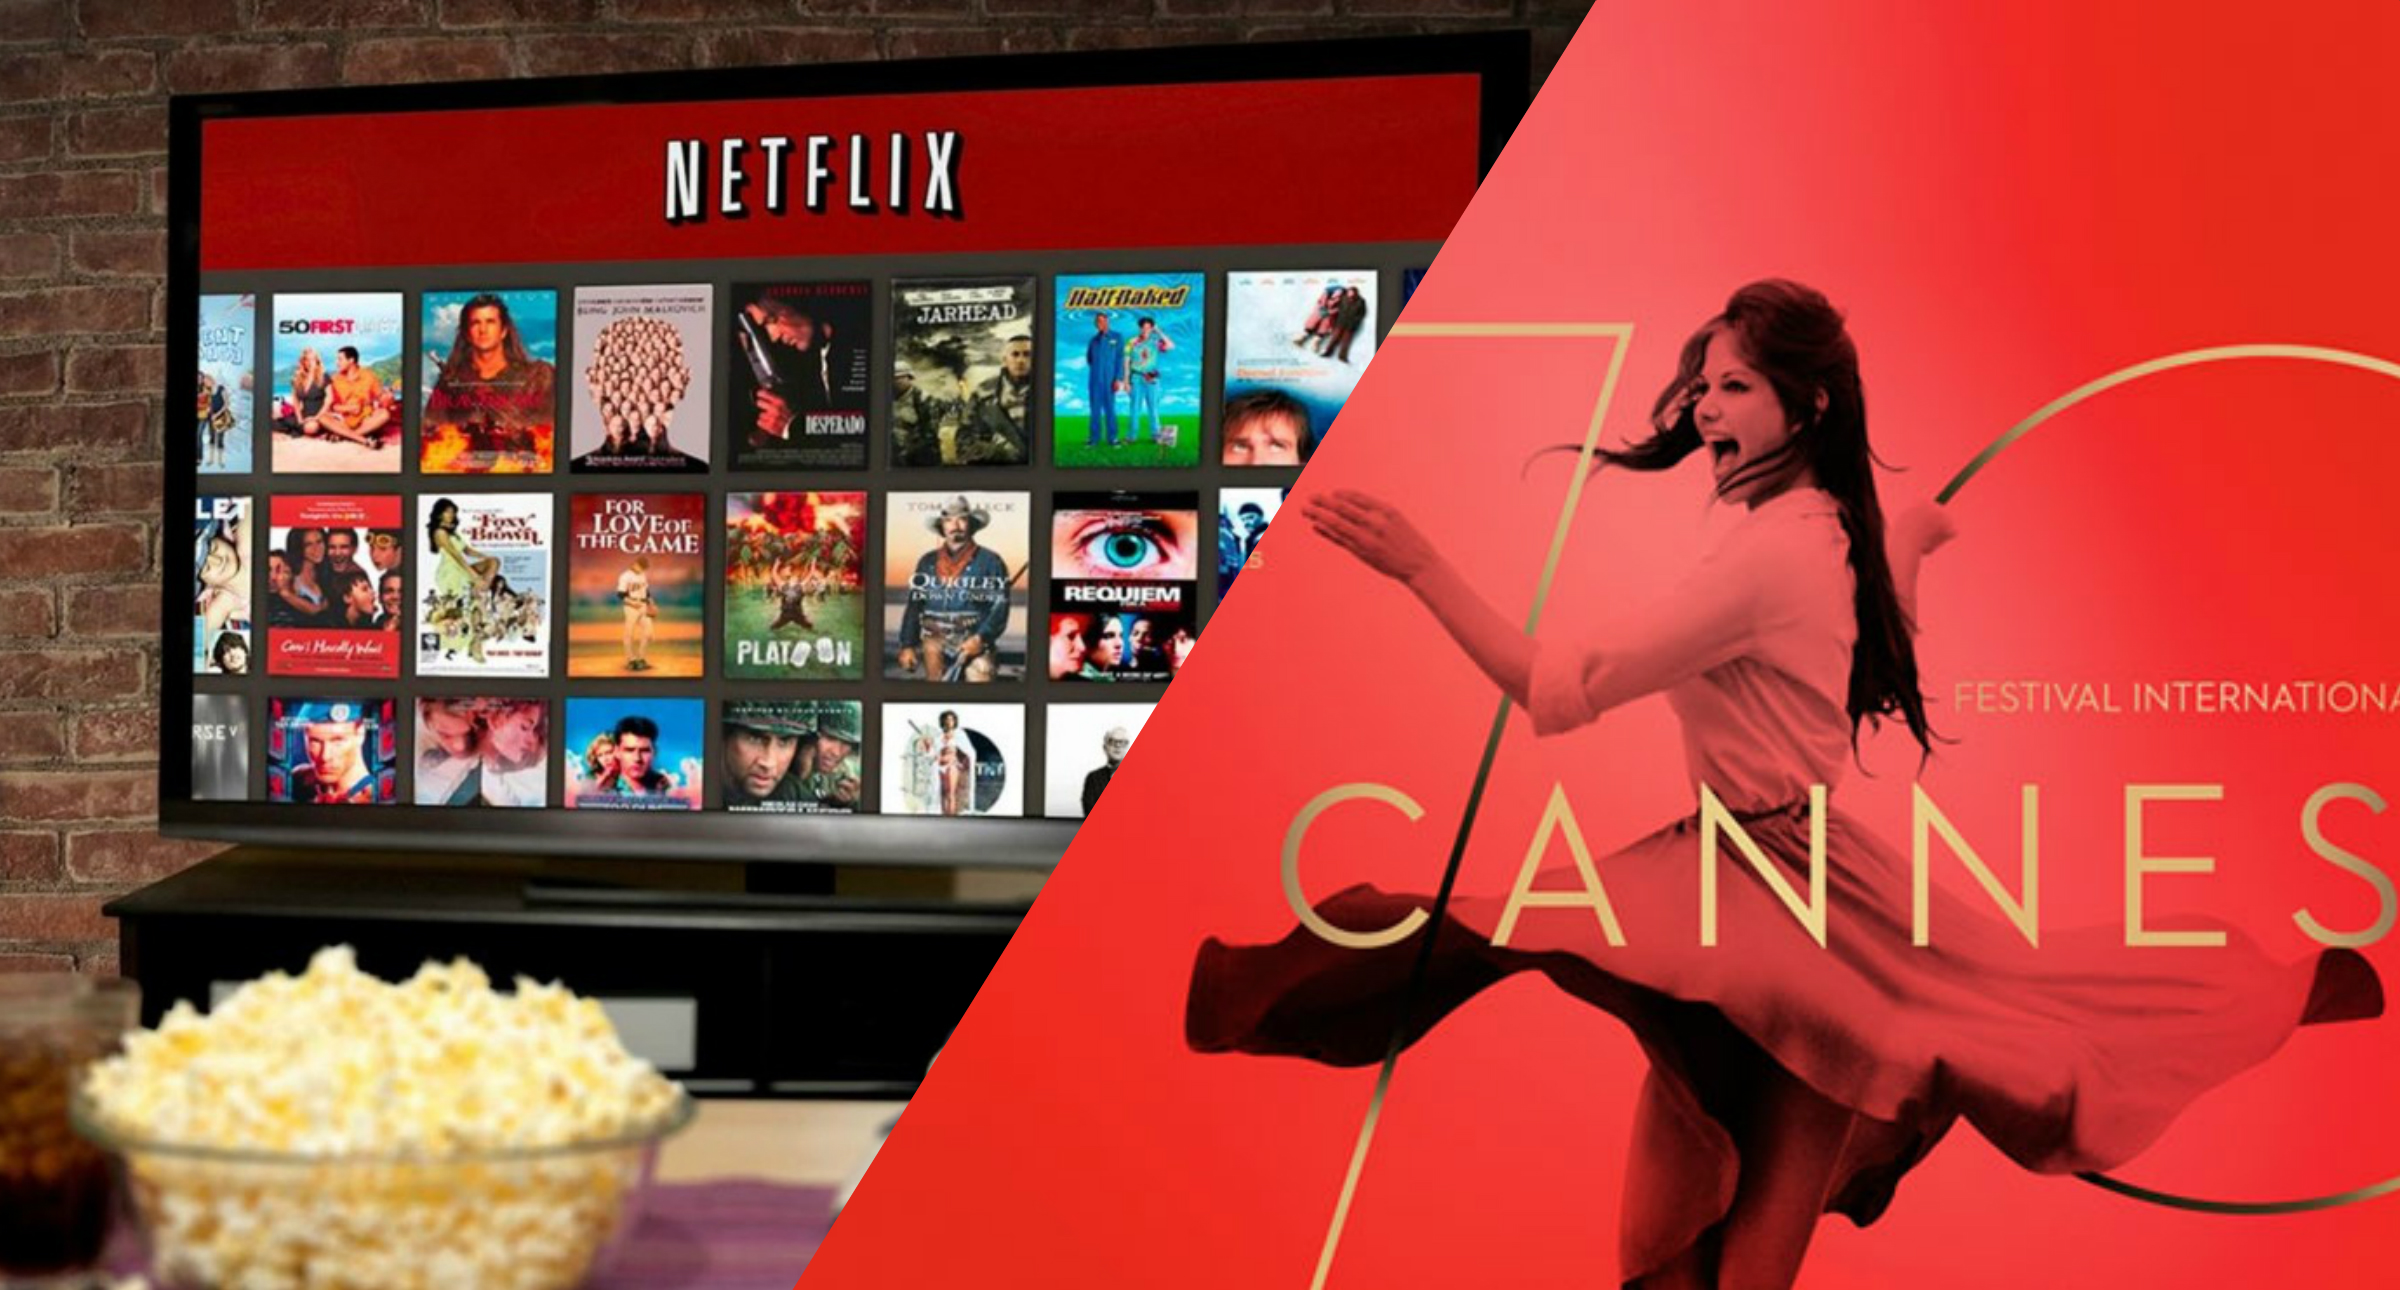 Cannes Netflix lite